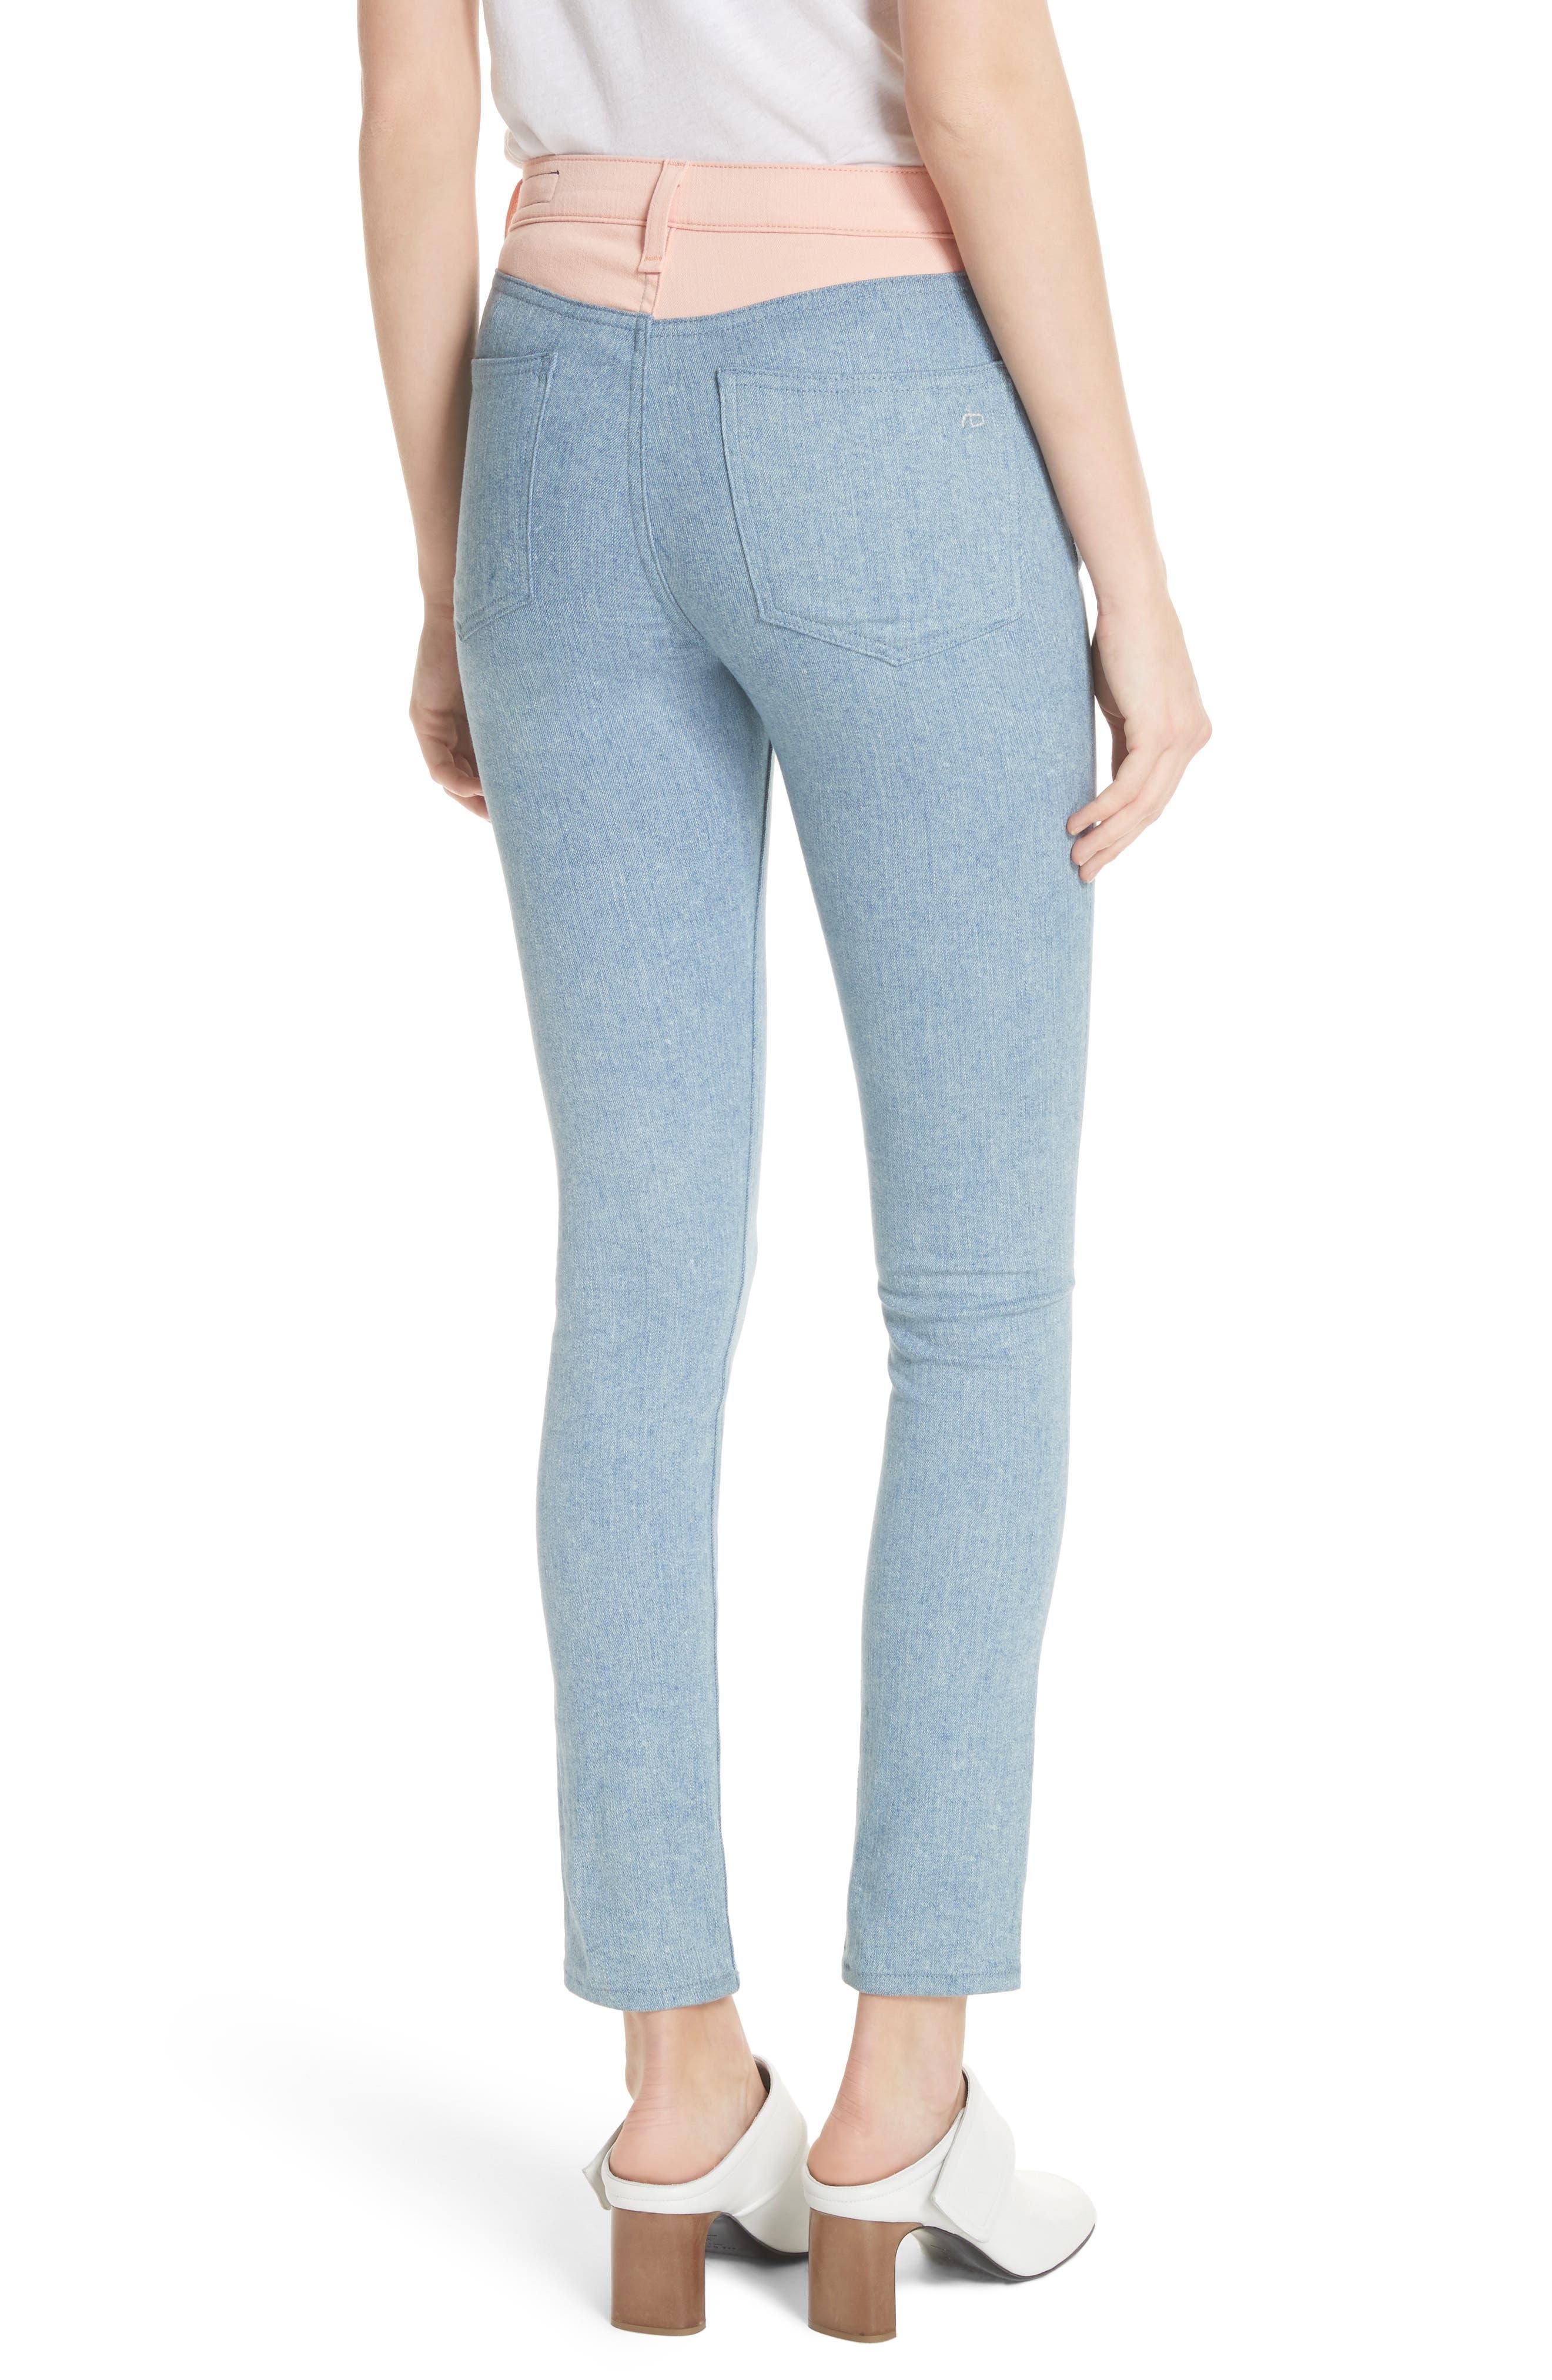 Phila Skinny Jeans,                             Alternate thumbnail 2, color,                             450